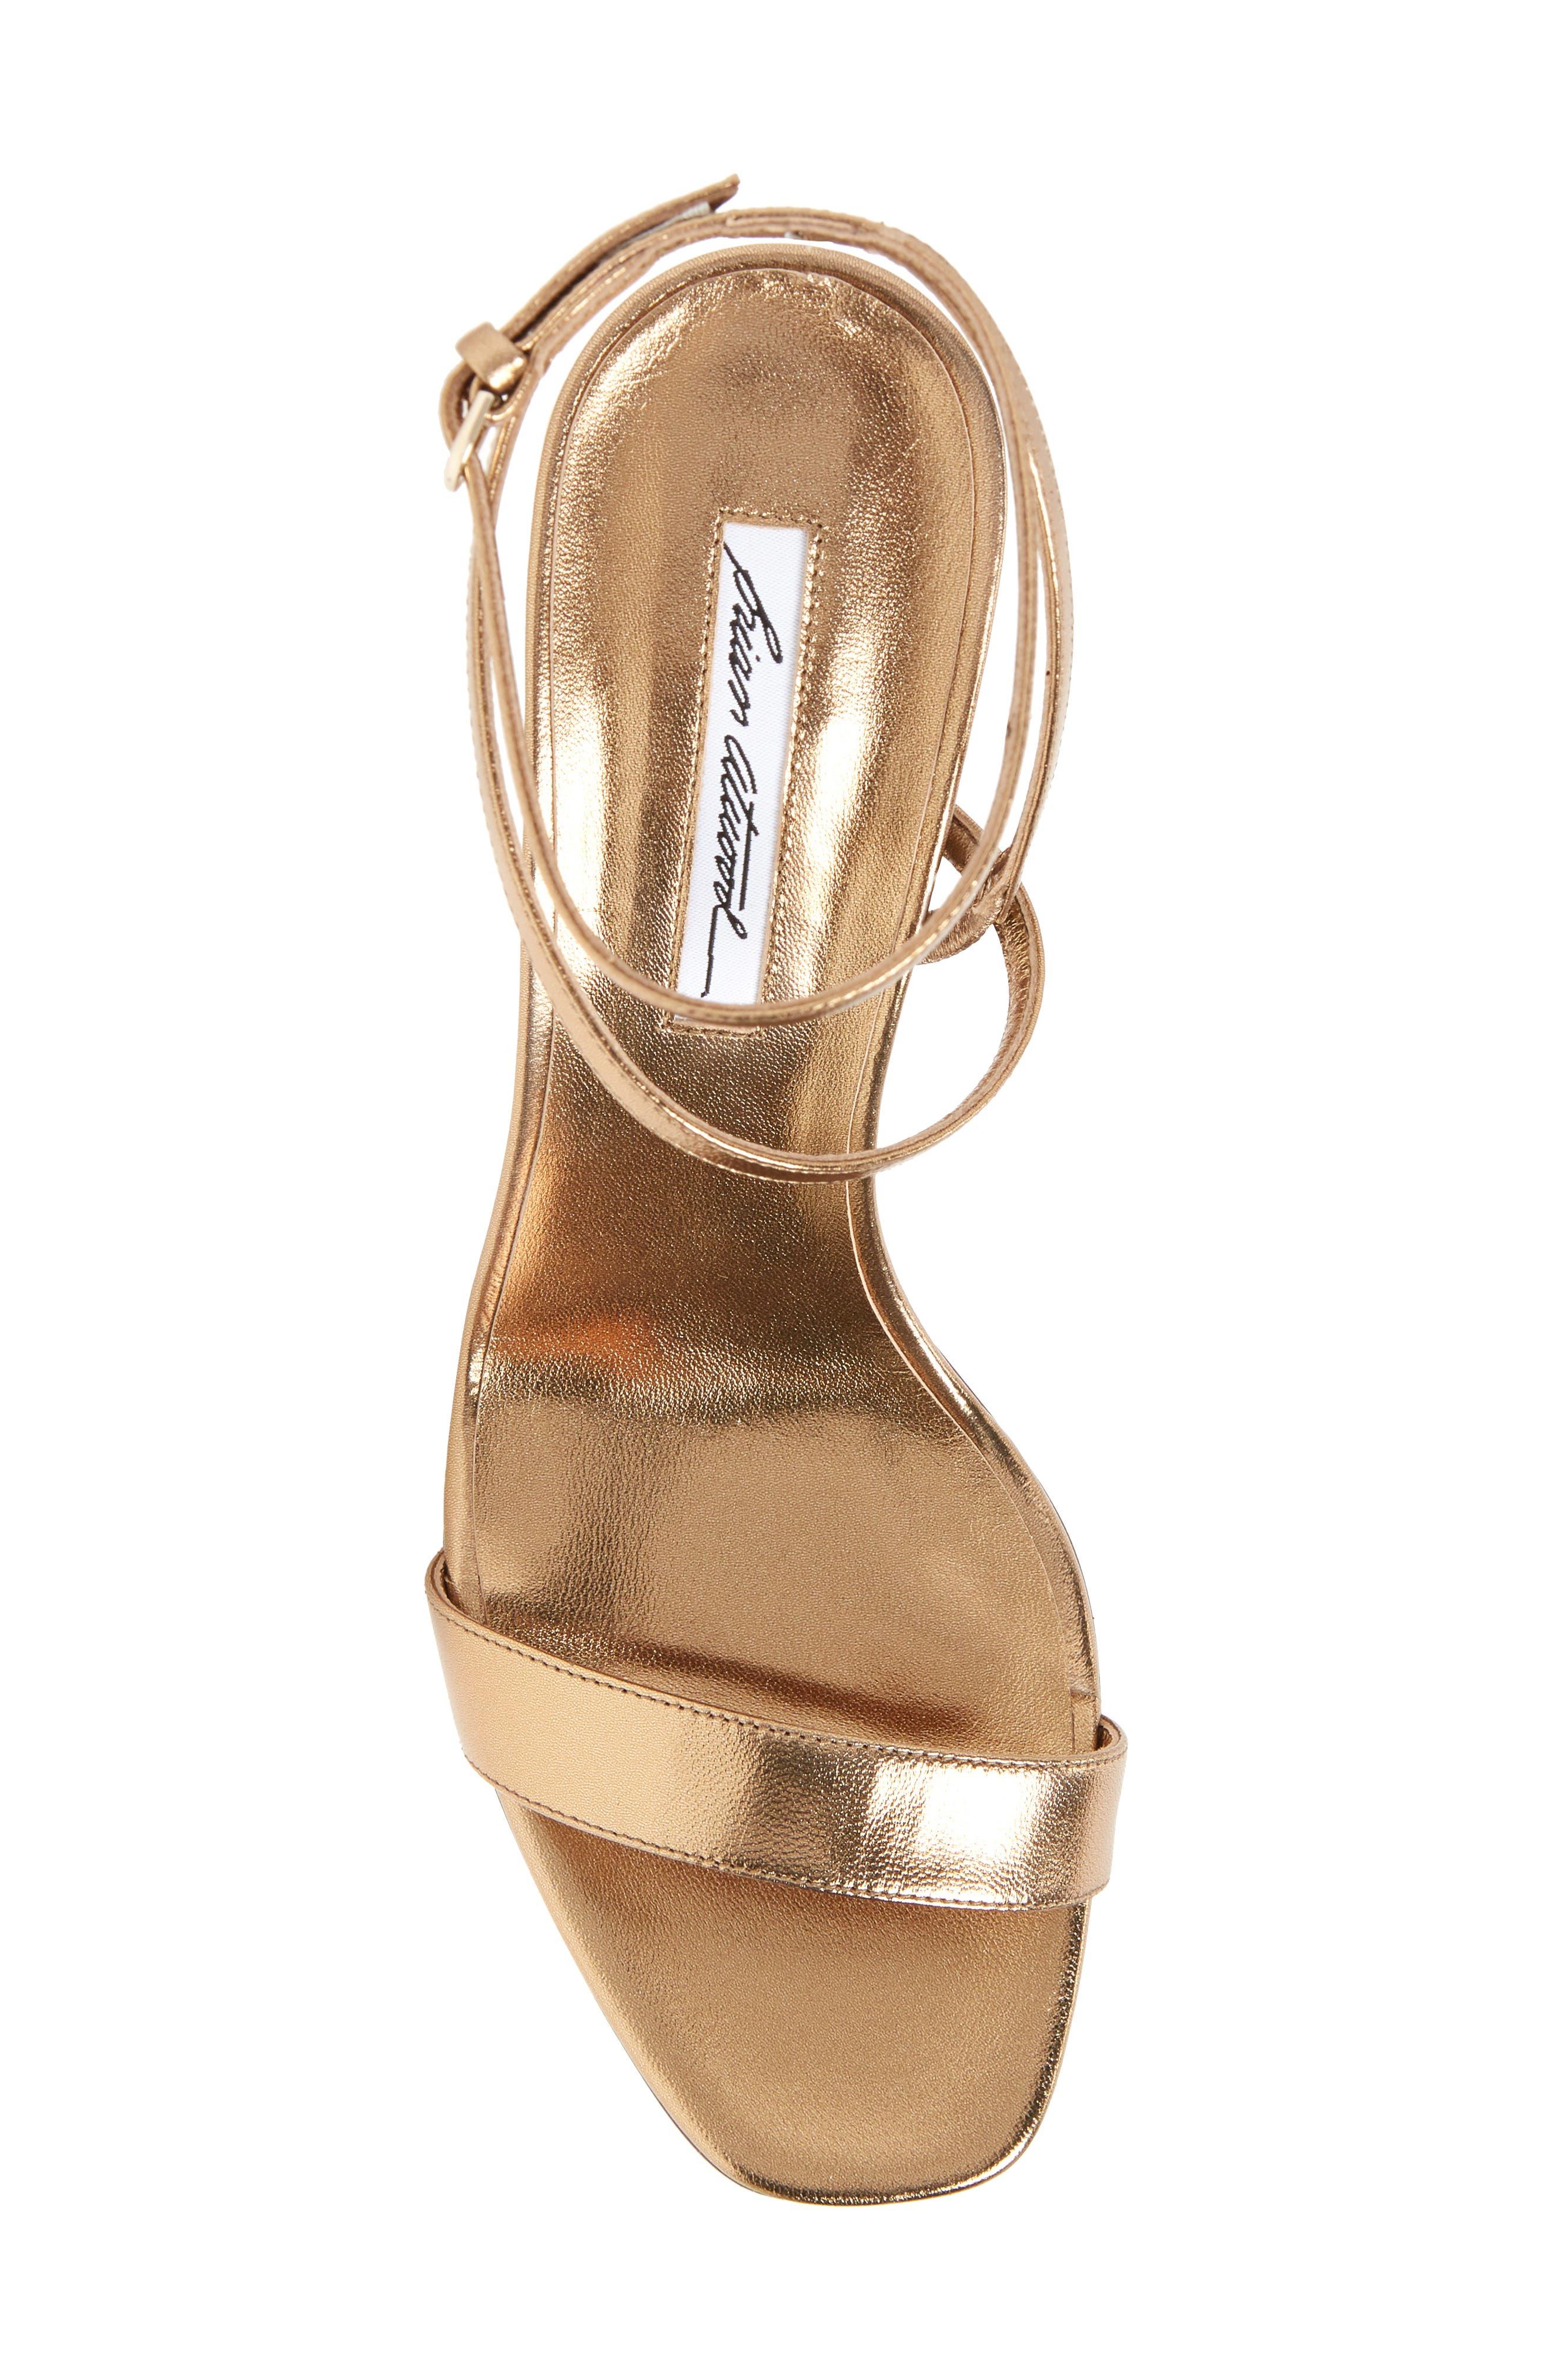 Sienna Ankle Strap Sandal,                             Alternate thumbnail 5, color,                             Bronze Metal Nappa